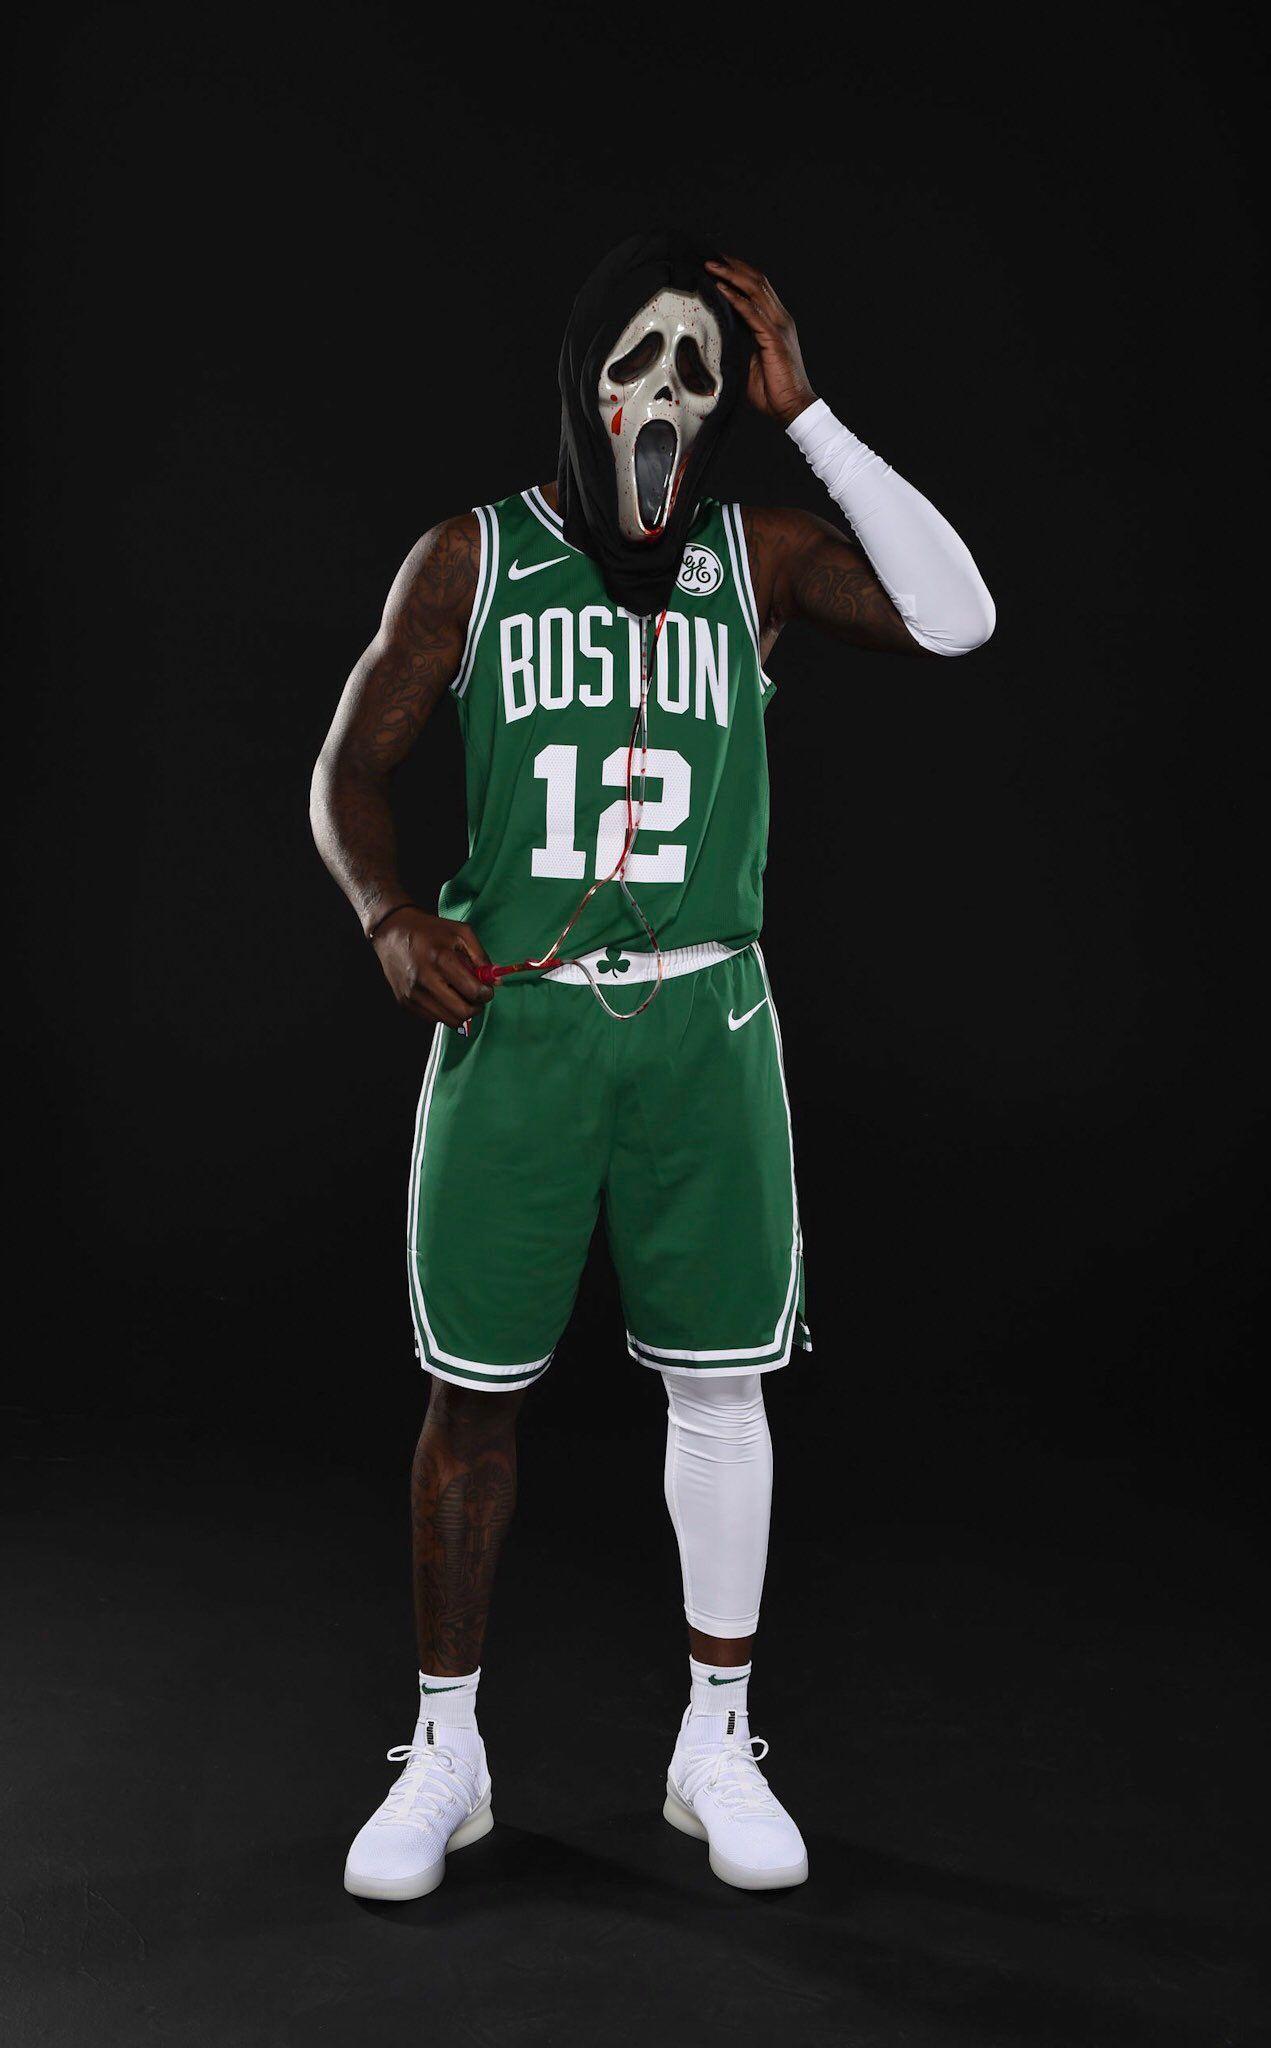 092418 Nba players, Boston celtics, Boston sports